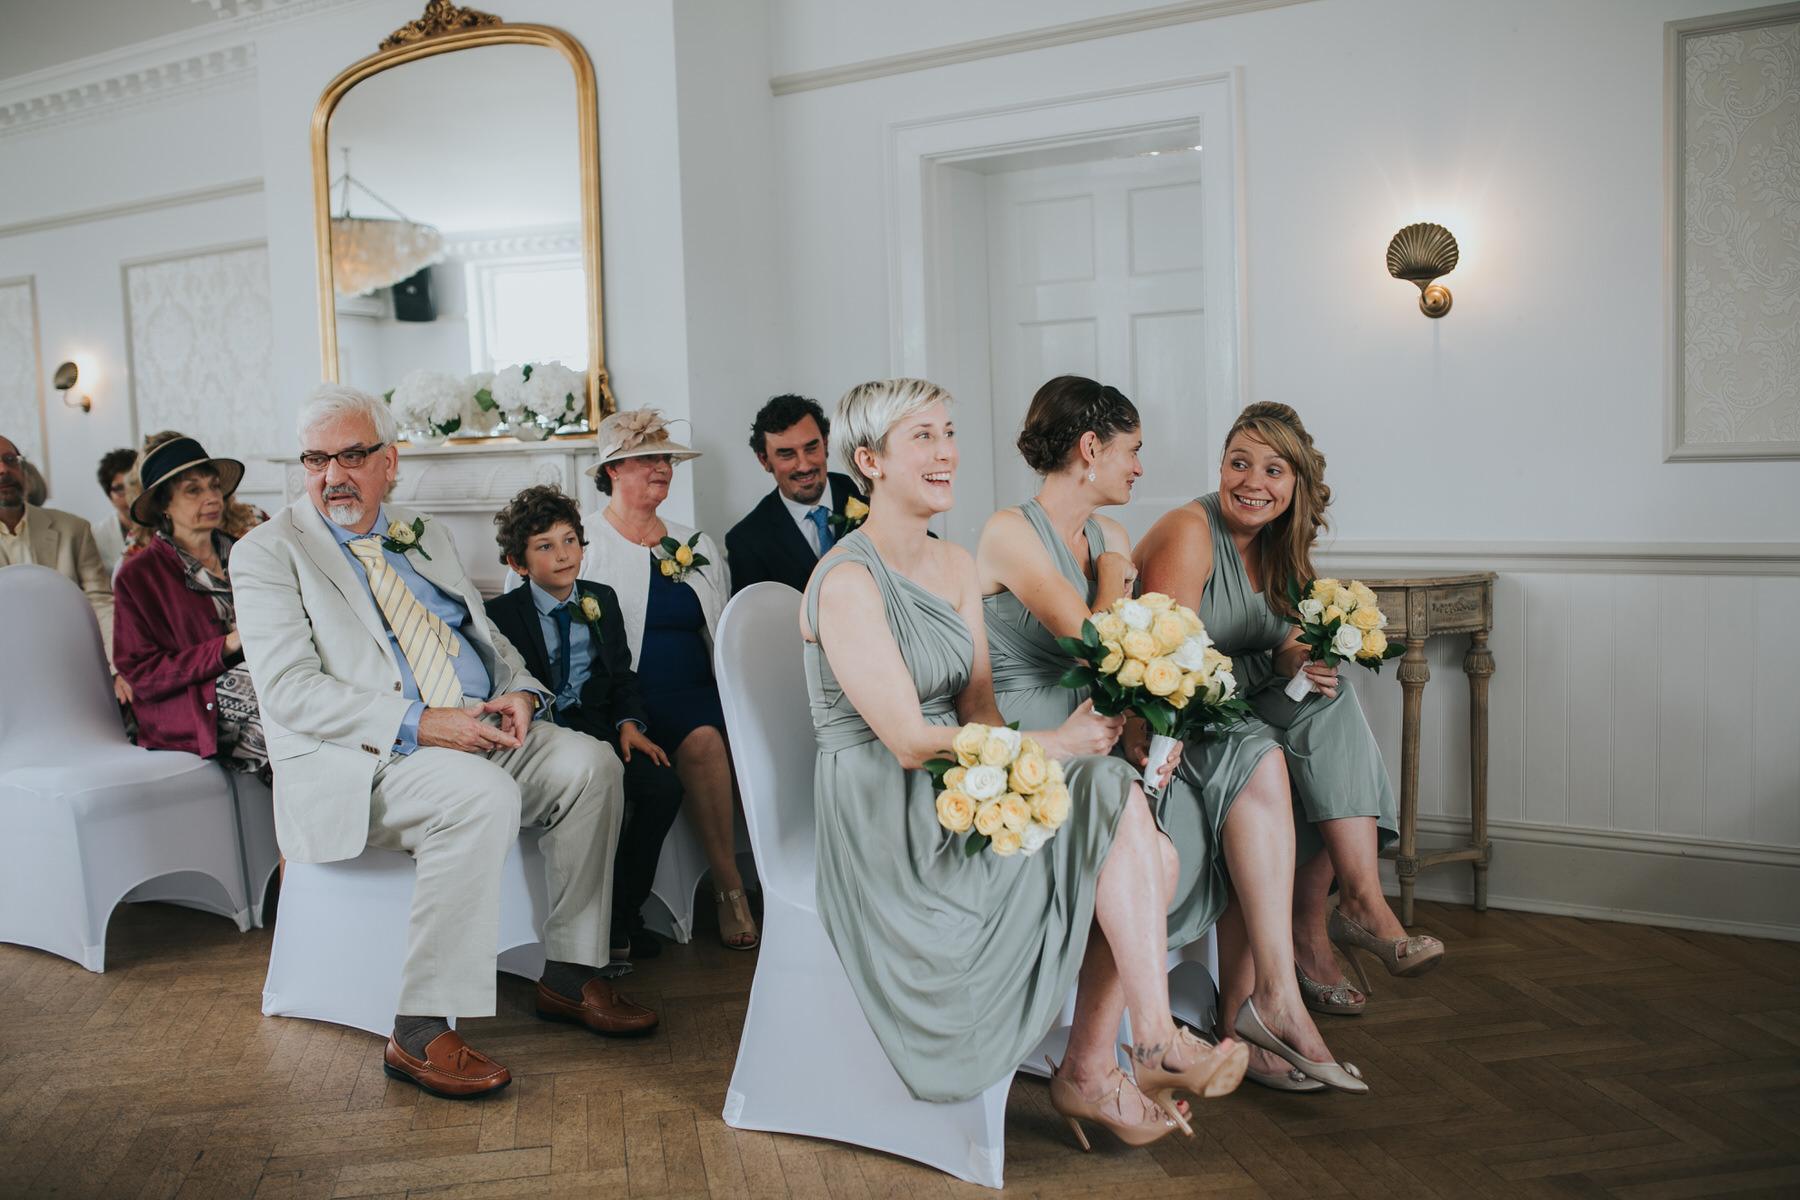 109 happy bridesmaids wearing mint dress yellow rose bouquets.jpg